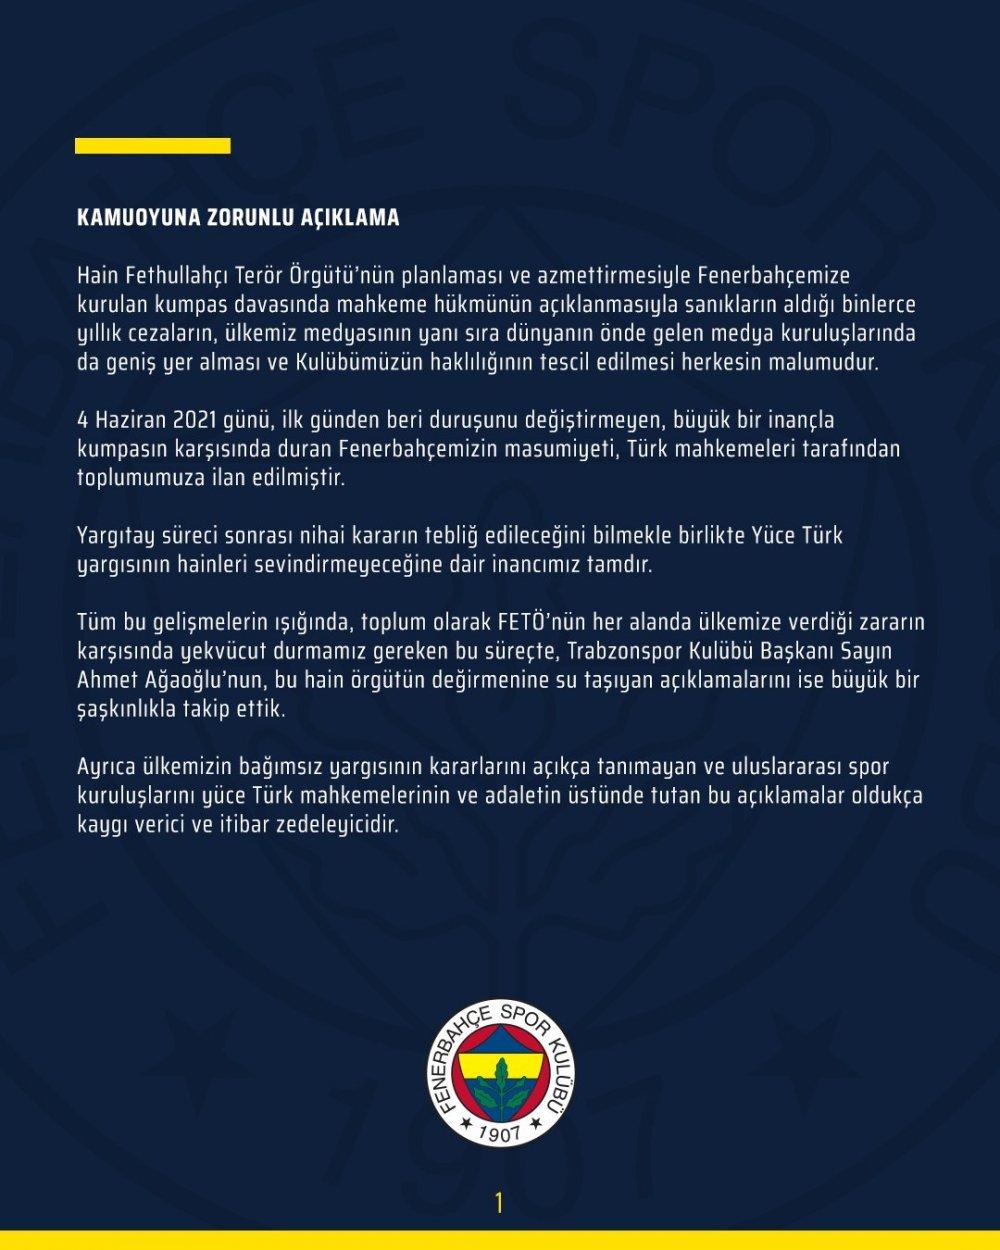 Ağaoğlu vurdu, Fenerbahçe'den ses geldi